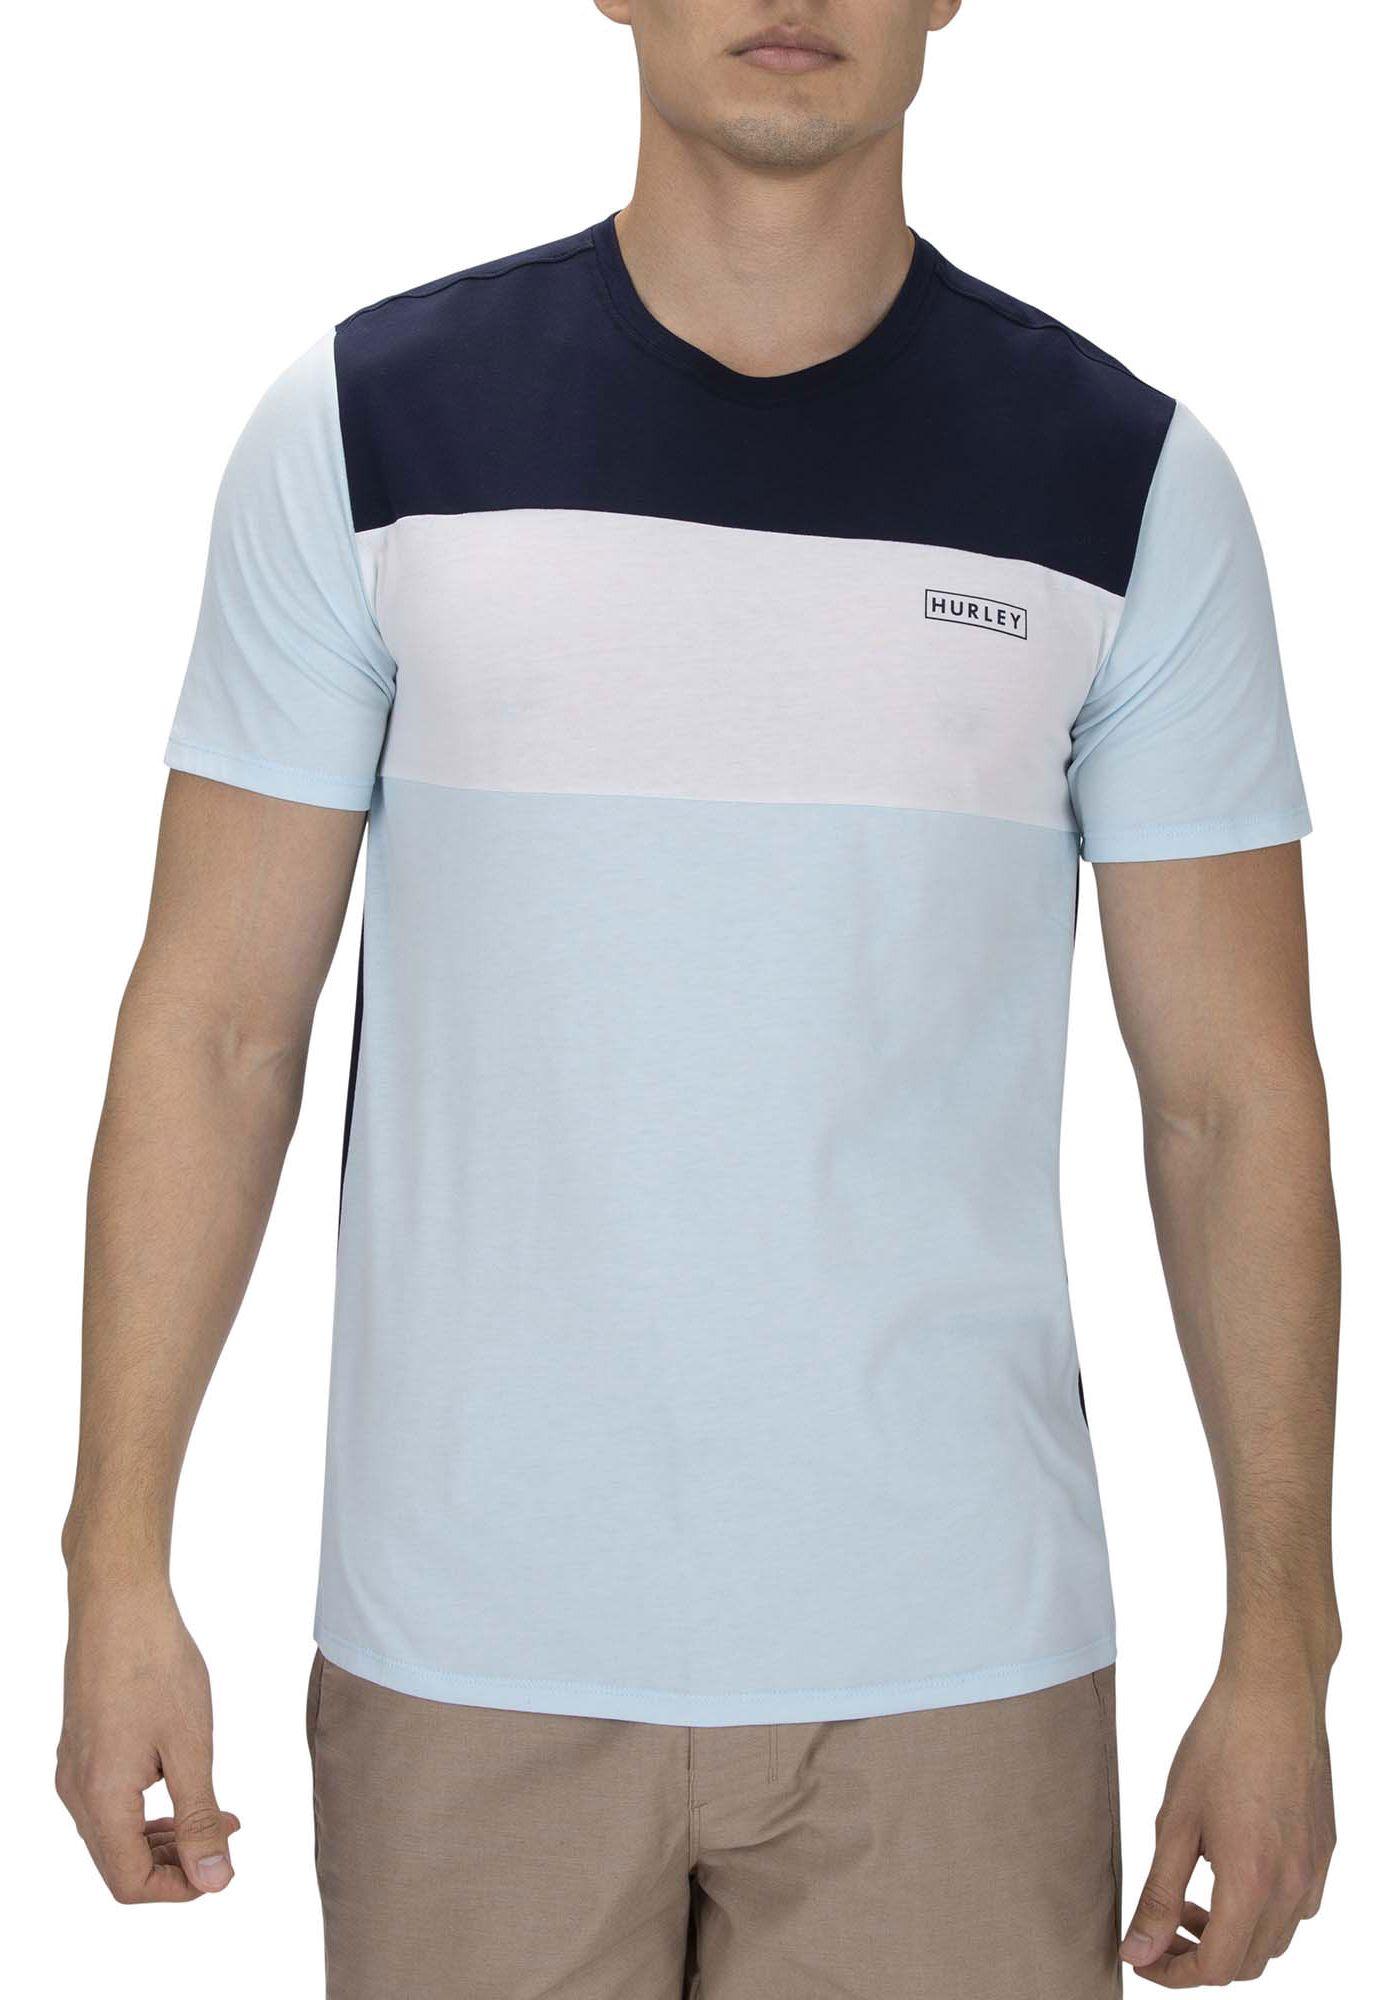 Hurley Men's Dri-FIT Blocked T-Shirt